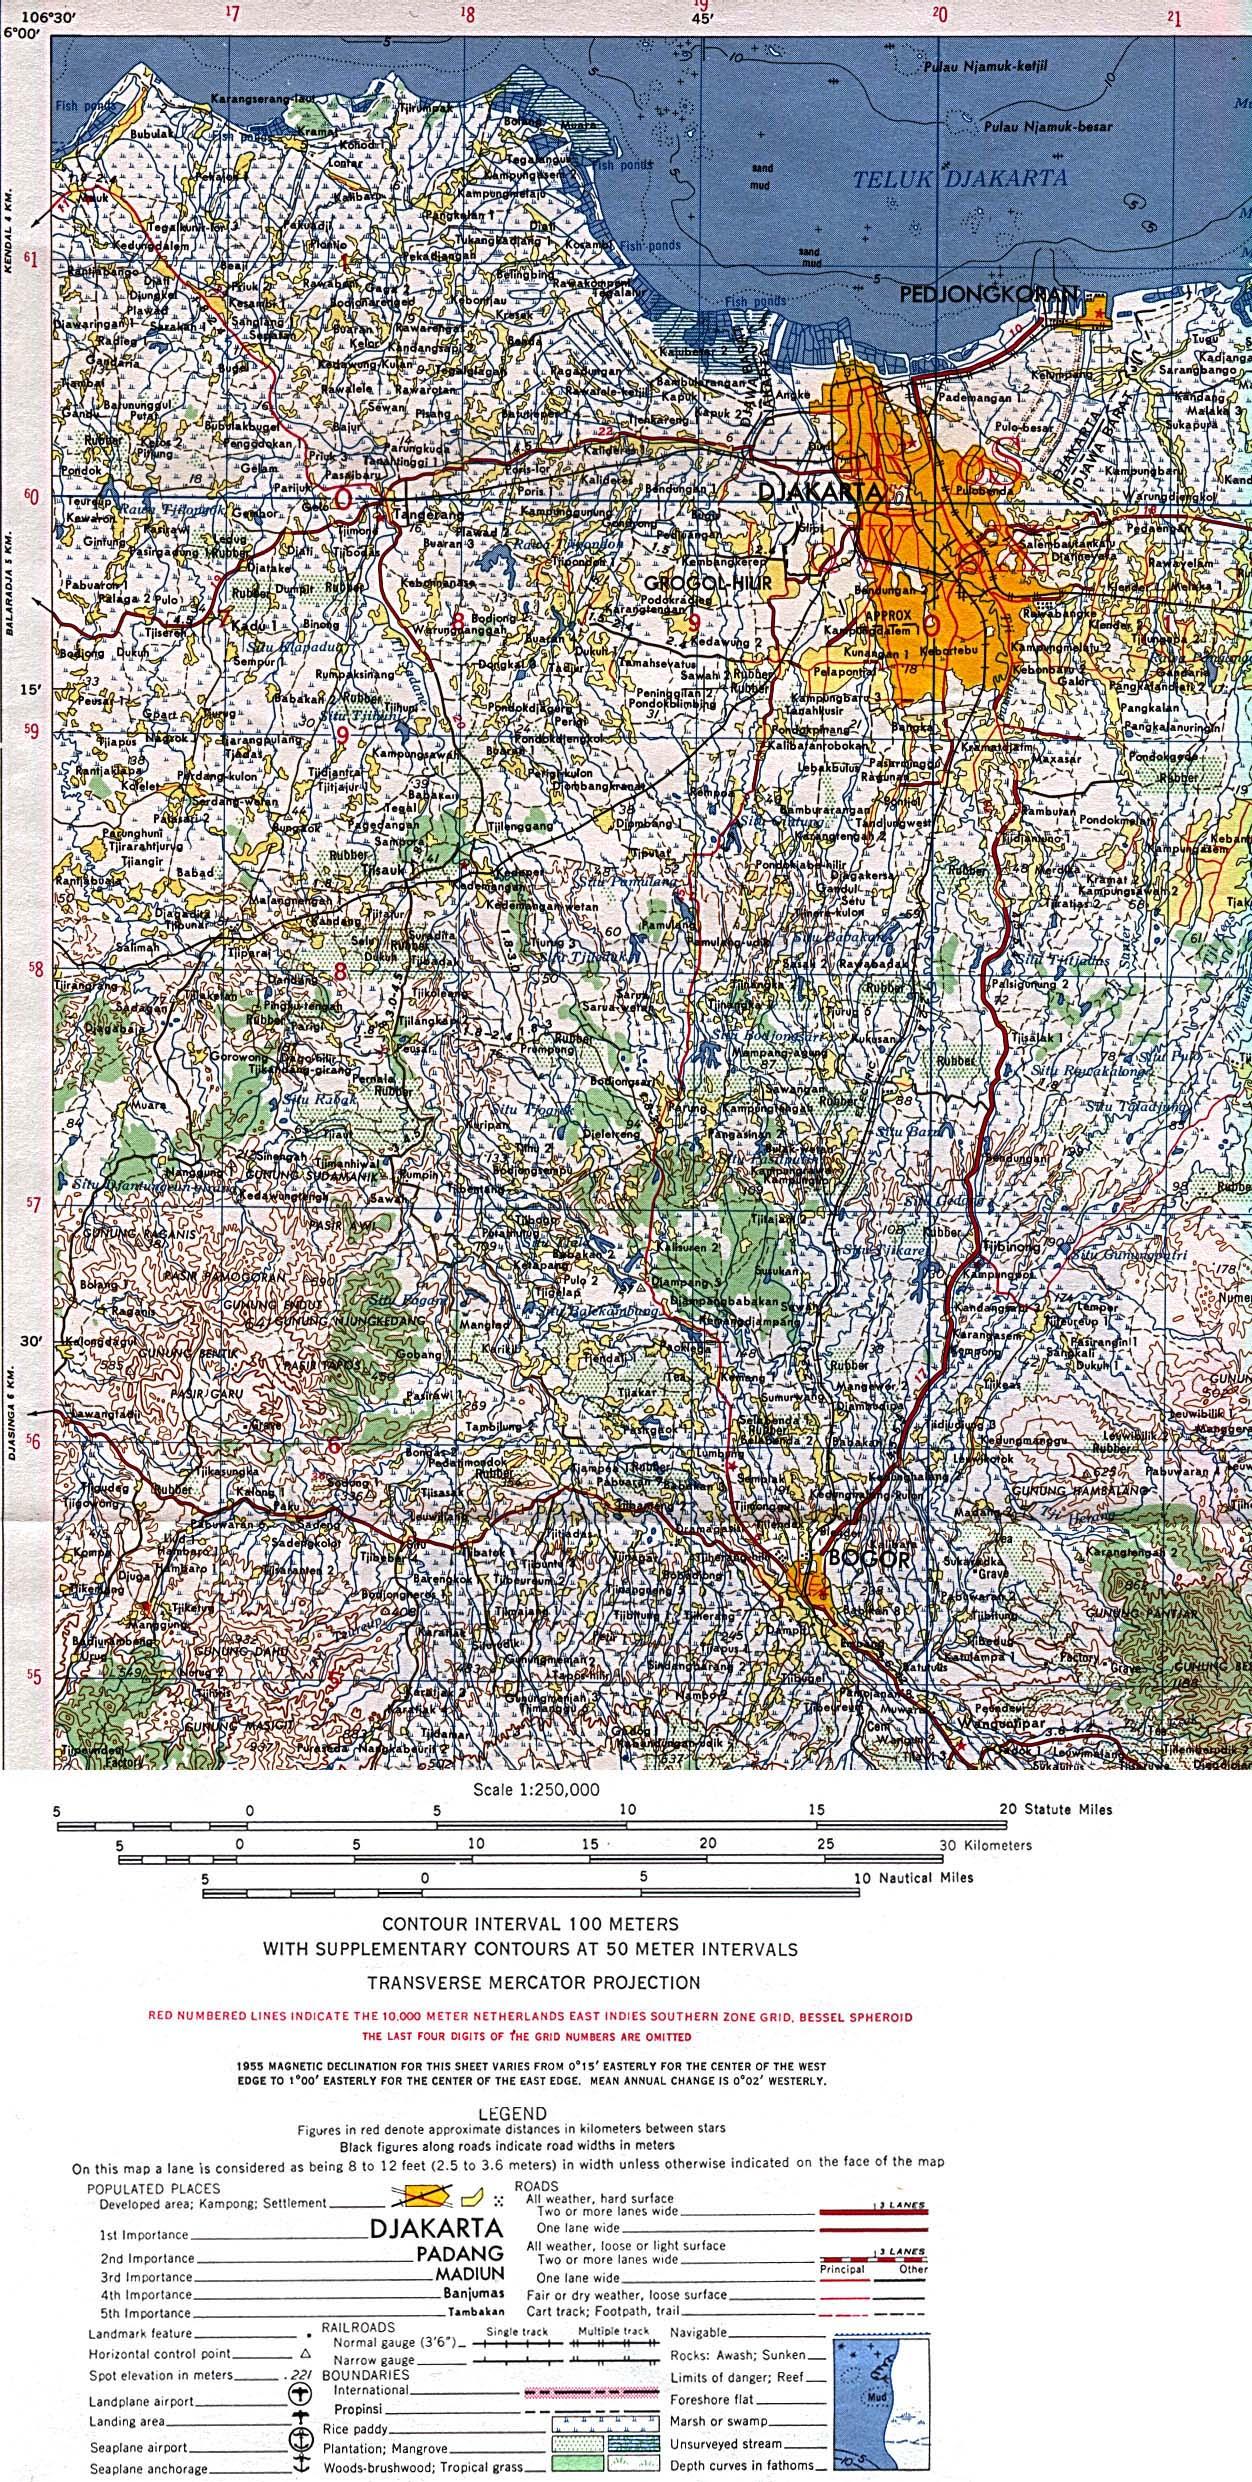 Download Map Jawa Bali Ets2 : download, Jakarta, World